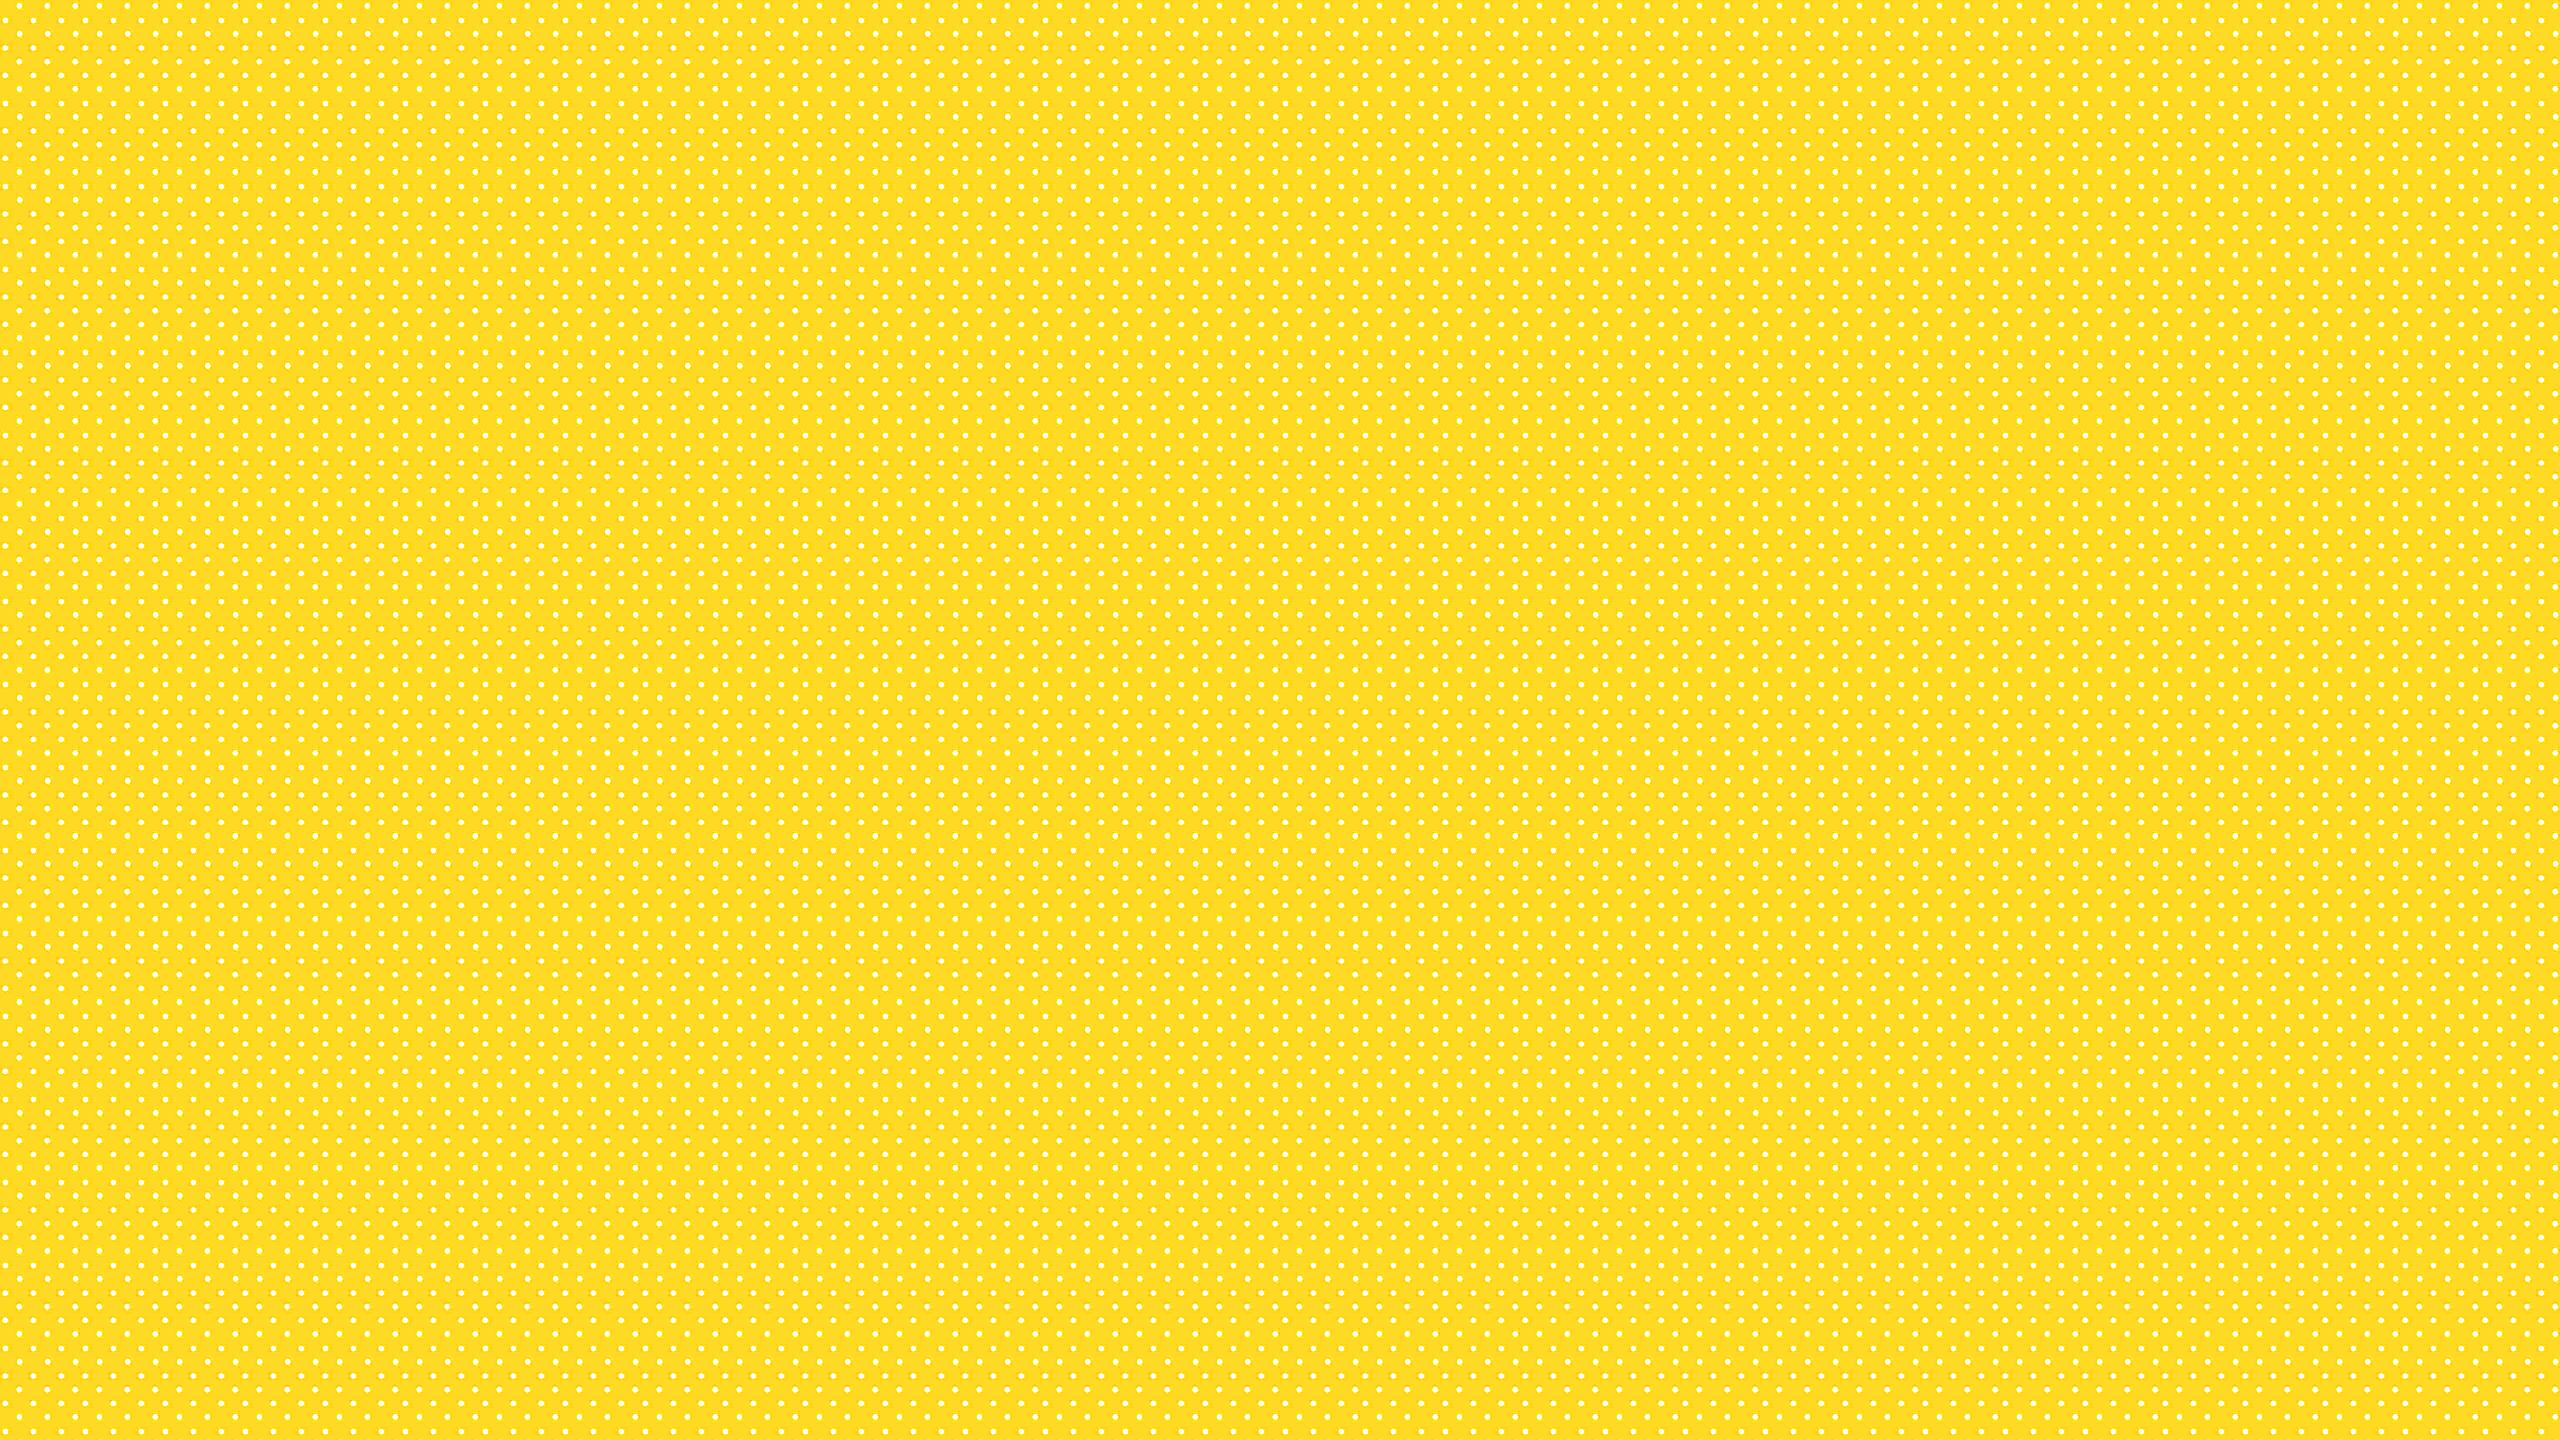 Yellow Aesthetic Tumblr Desktop Wallpapers Top Free Yellow